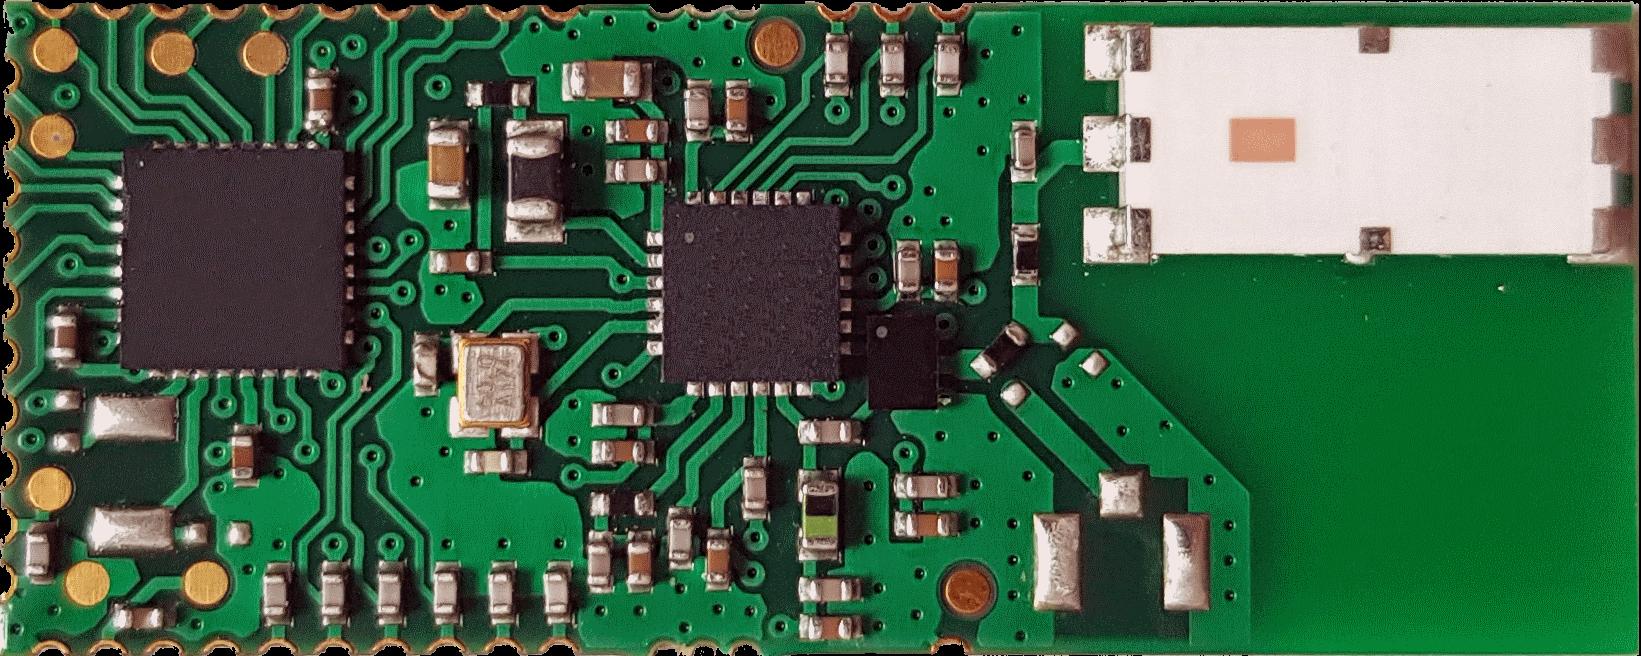 SIGFOX-MOD1-C